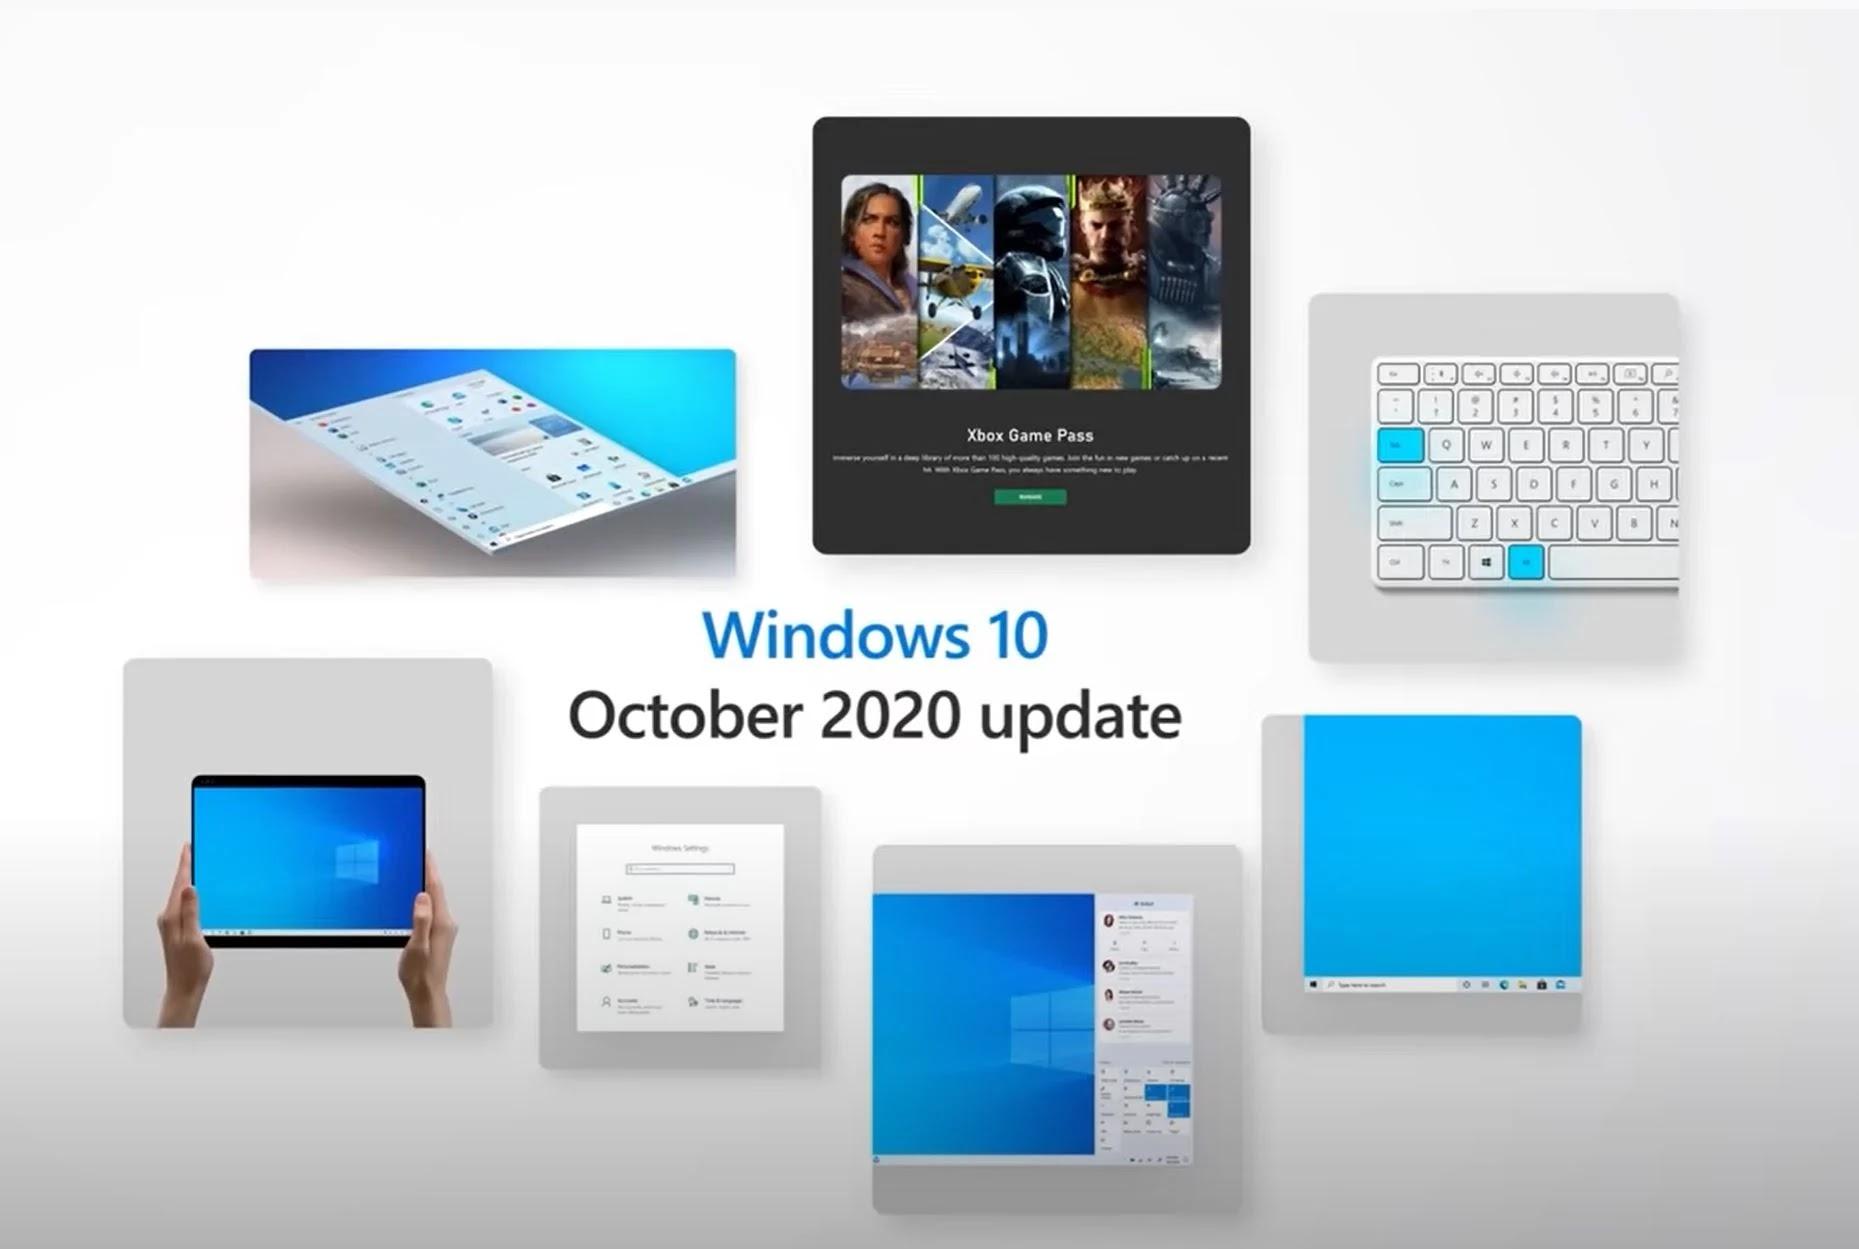 Come ottenere Windows 10 October 2020 Update